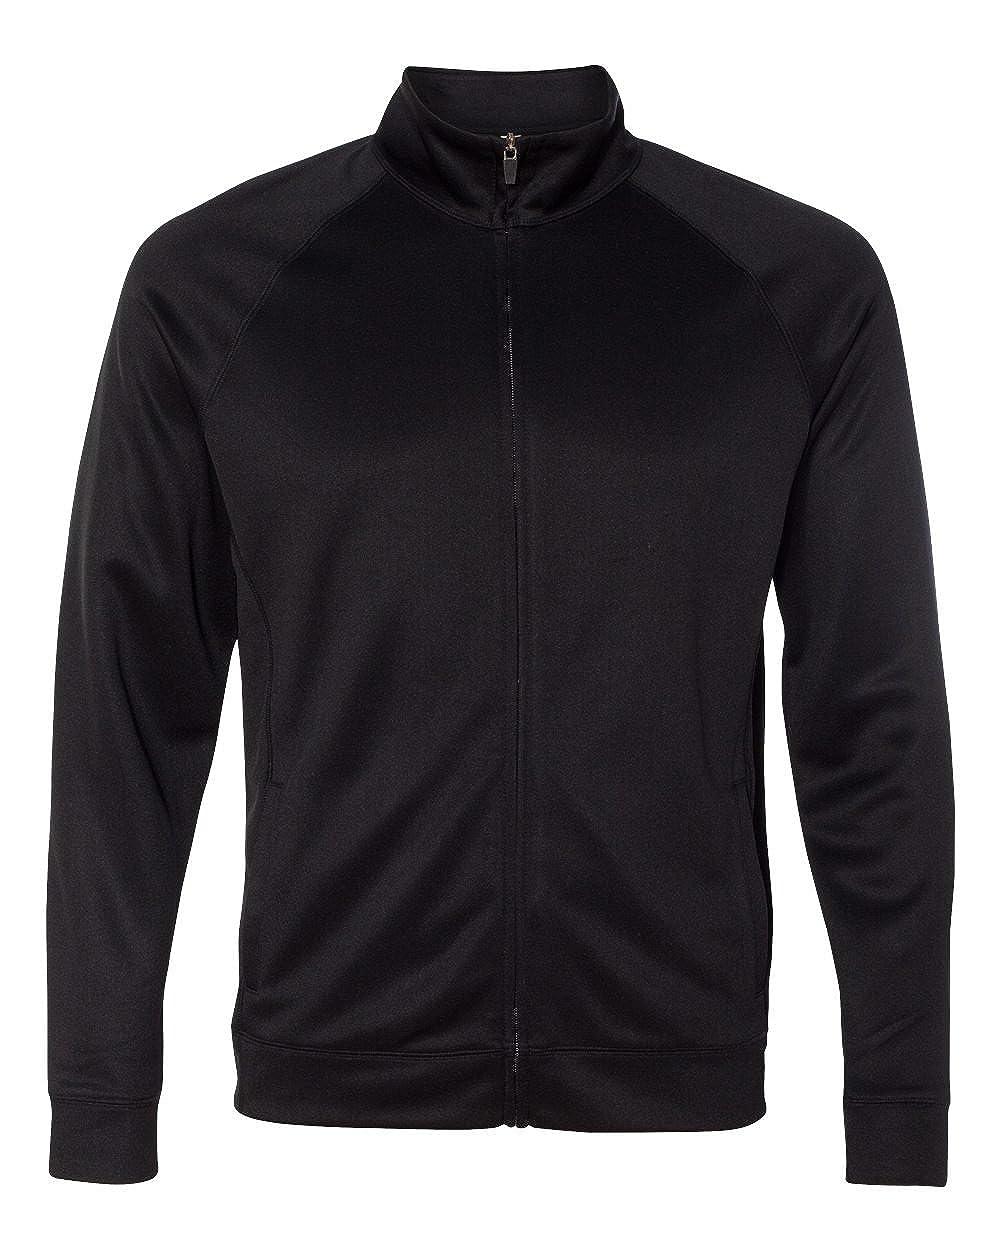 Buy Cool Shirts Mens Moisture Wicking Lightweight Jacket